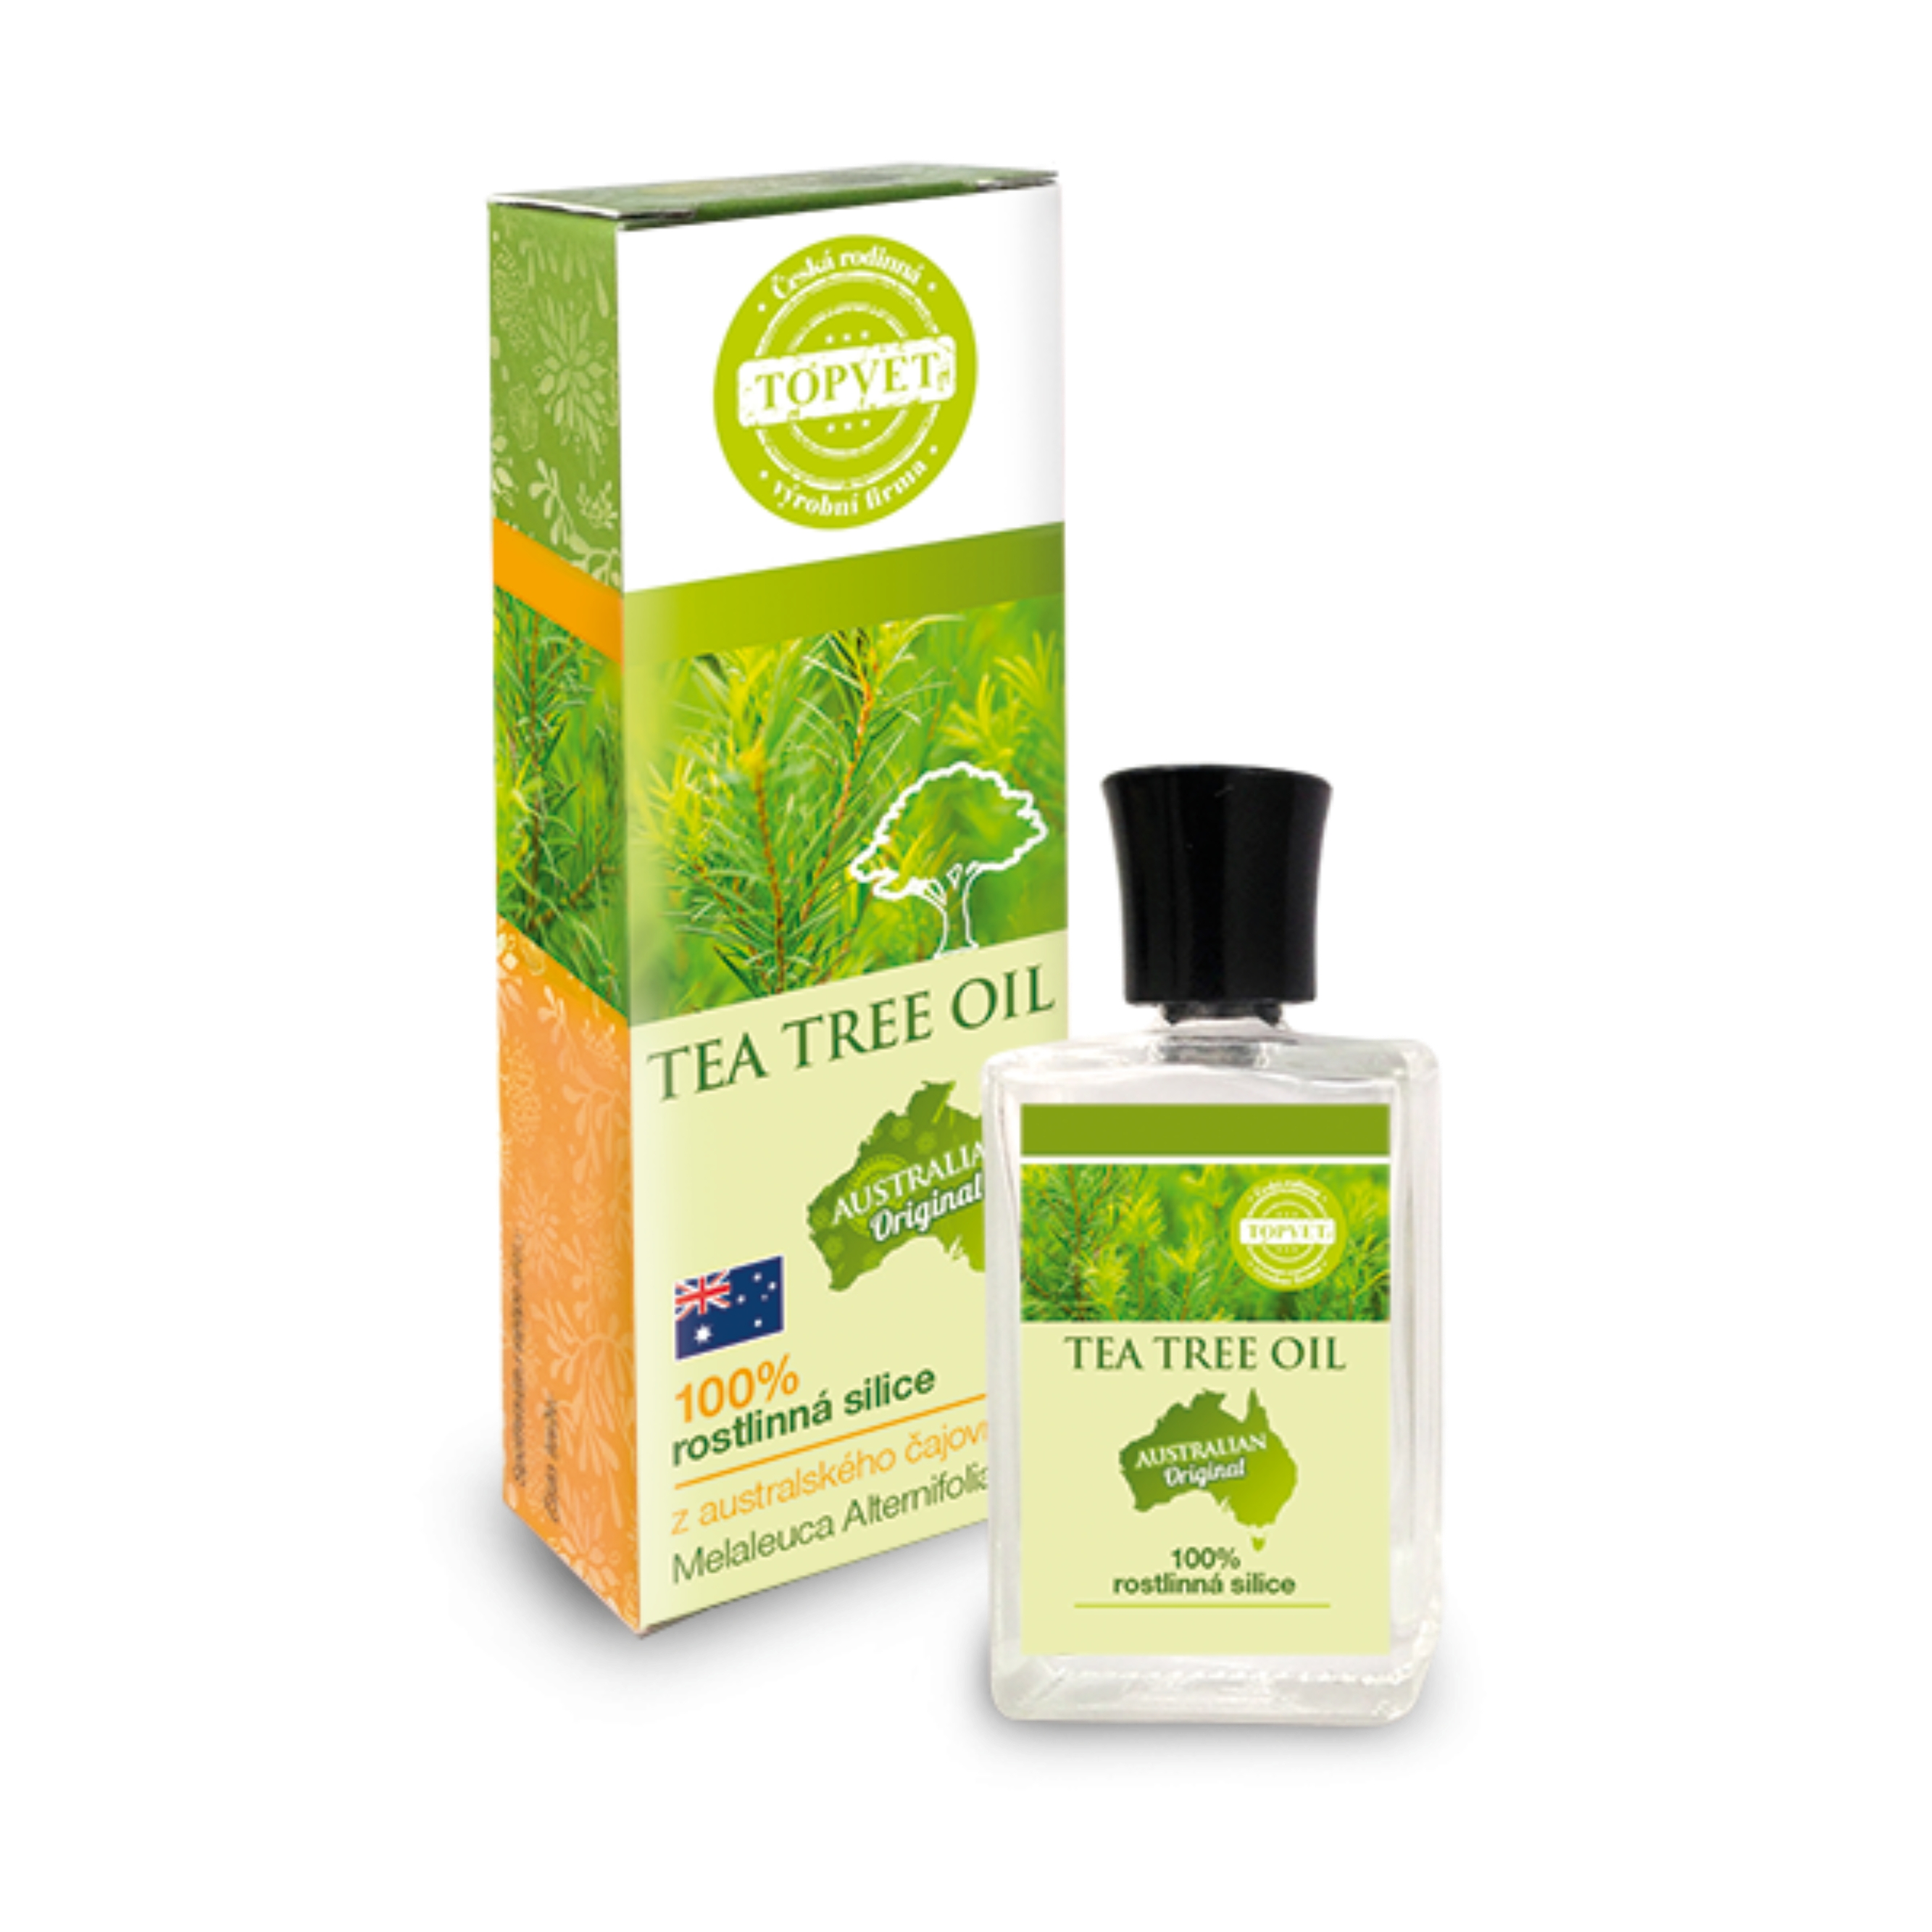 TOPVET Tea tree oil - éterický olej - rastlinná silica 10 ml 10 ml